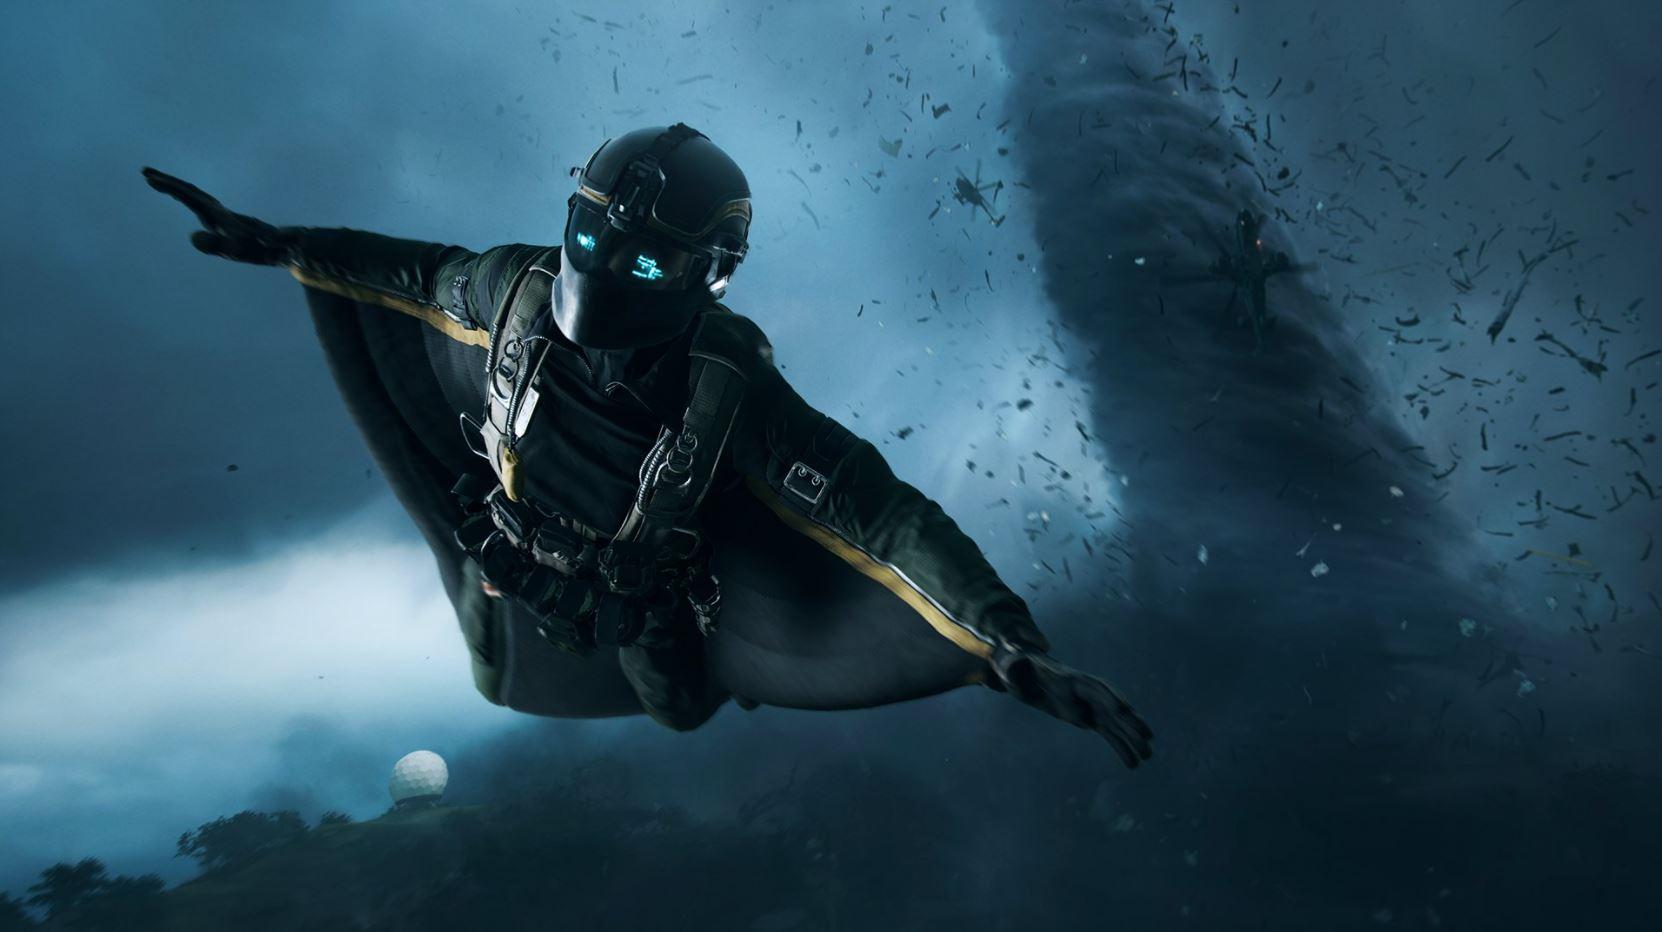 battlefield-2042-cover-art-and-screenshots-leak-on-origin-ahead-of-reveal-1